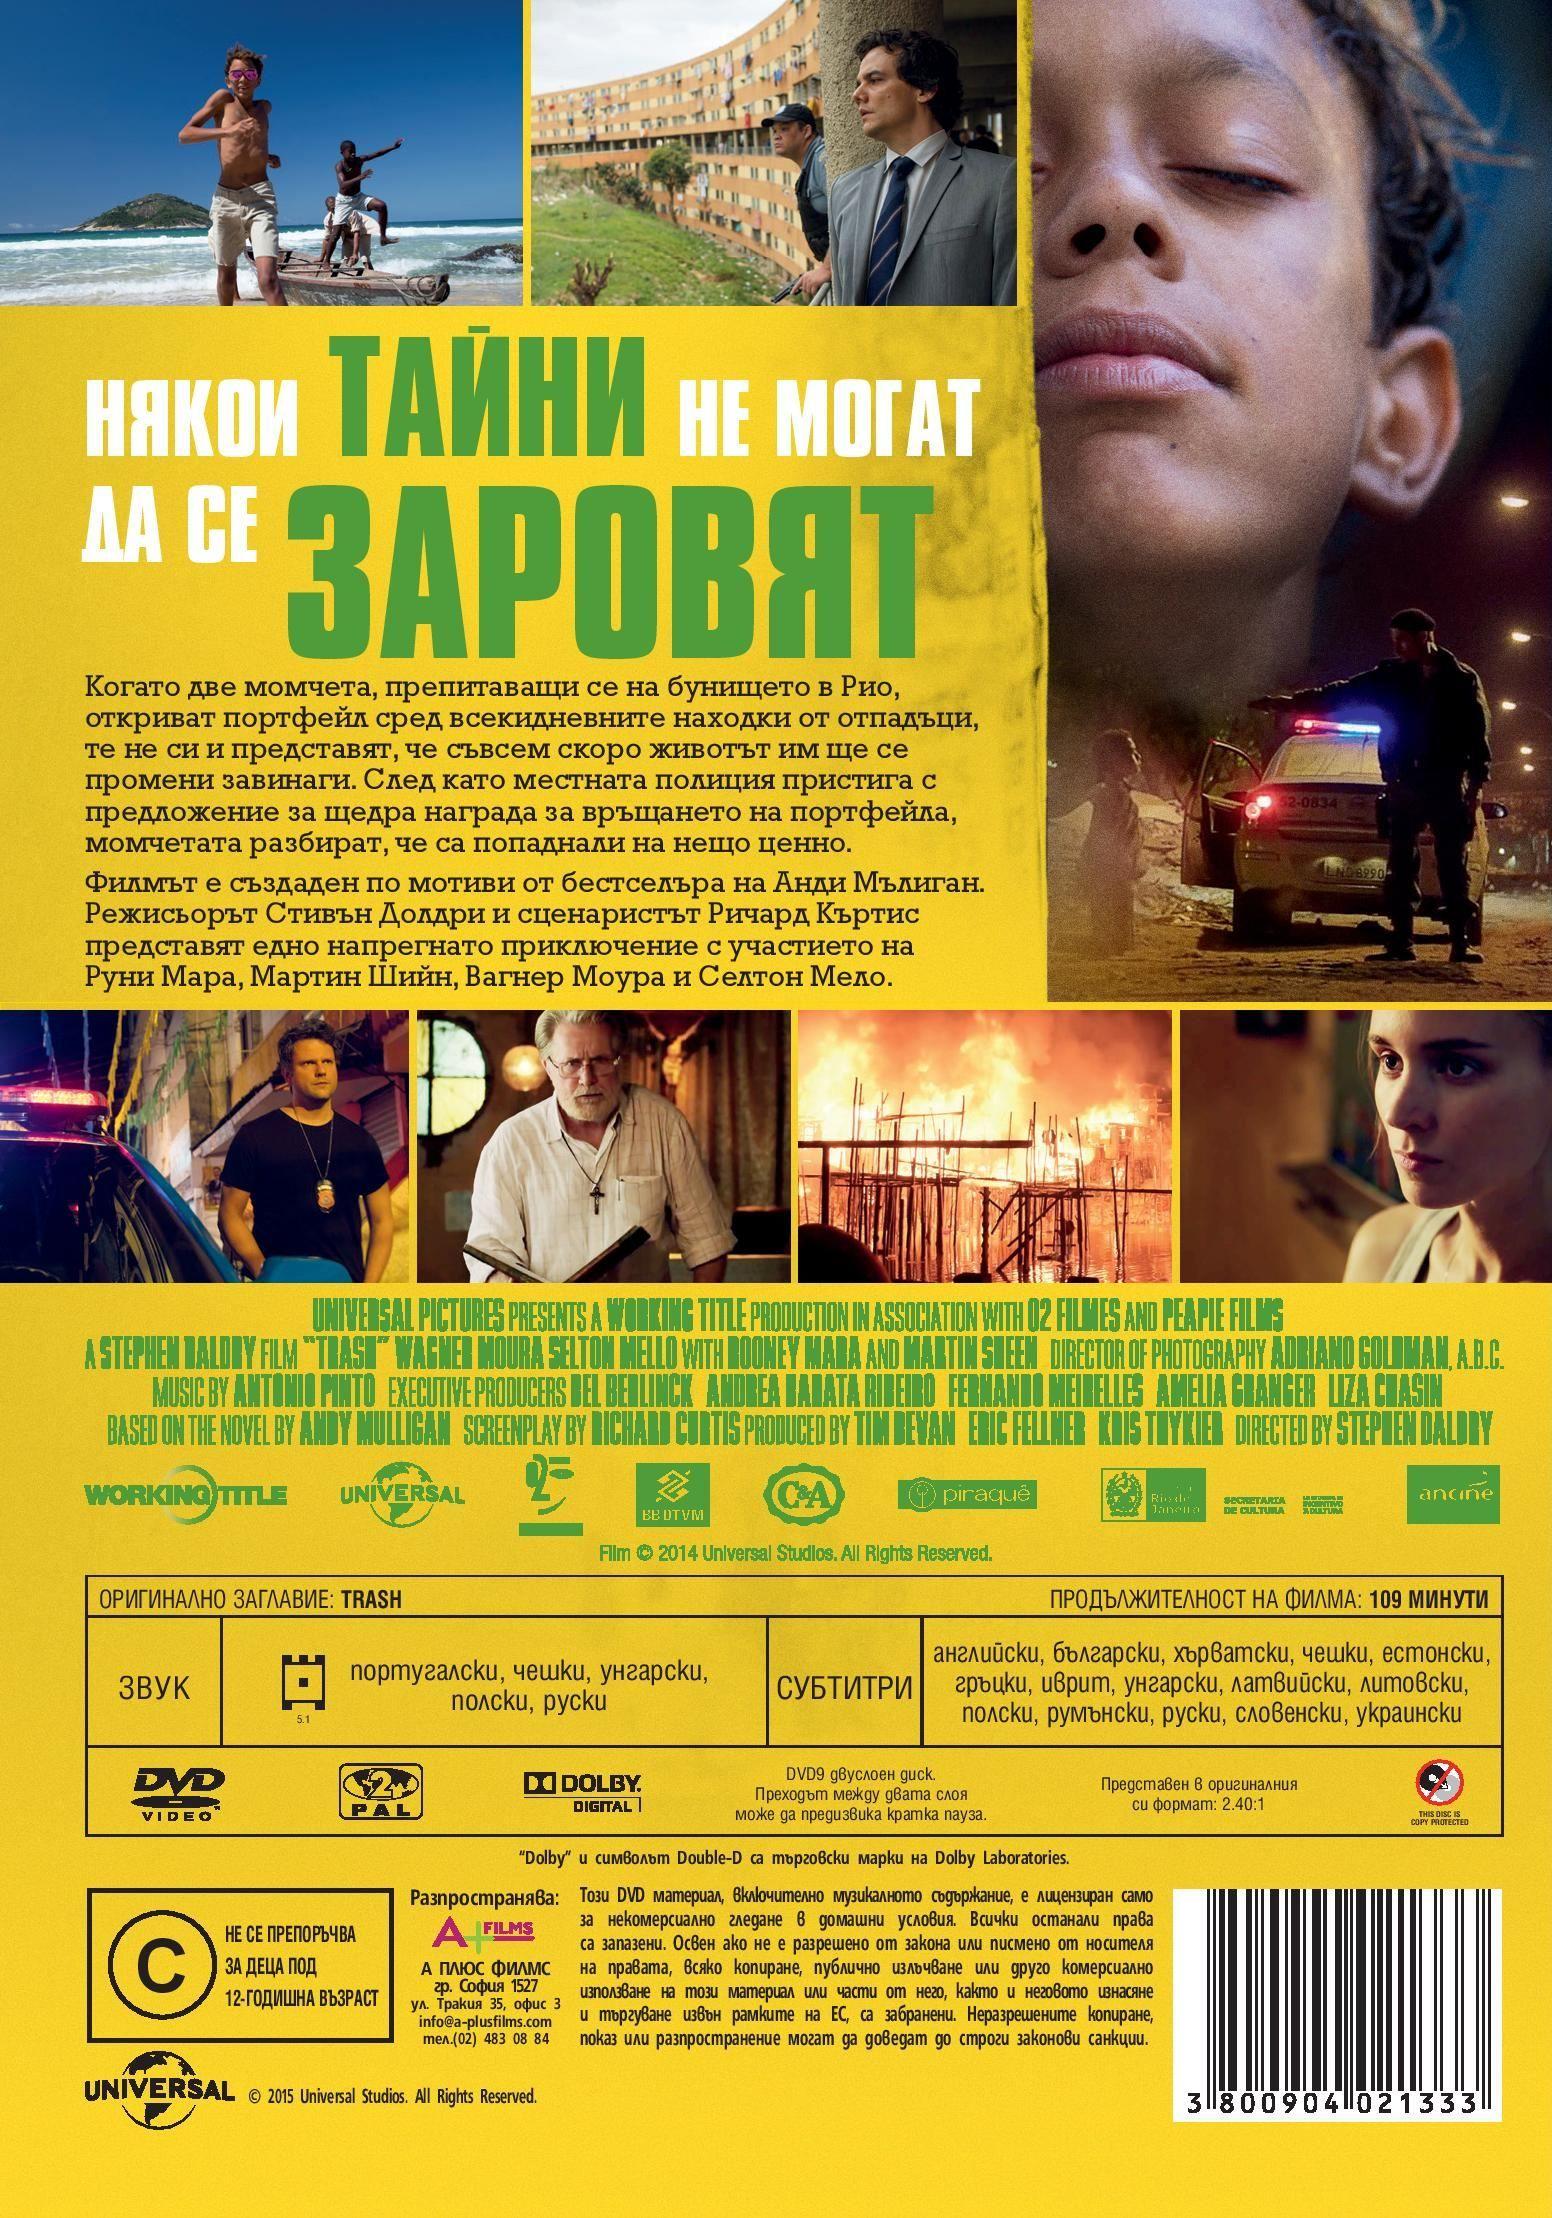 Измет (DVD) - 3